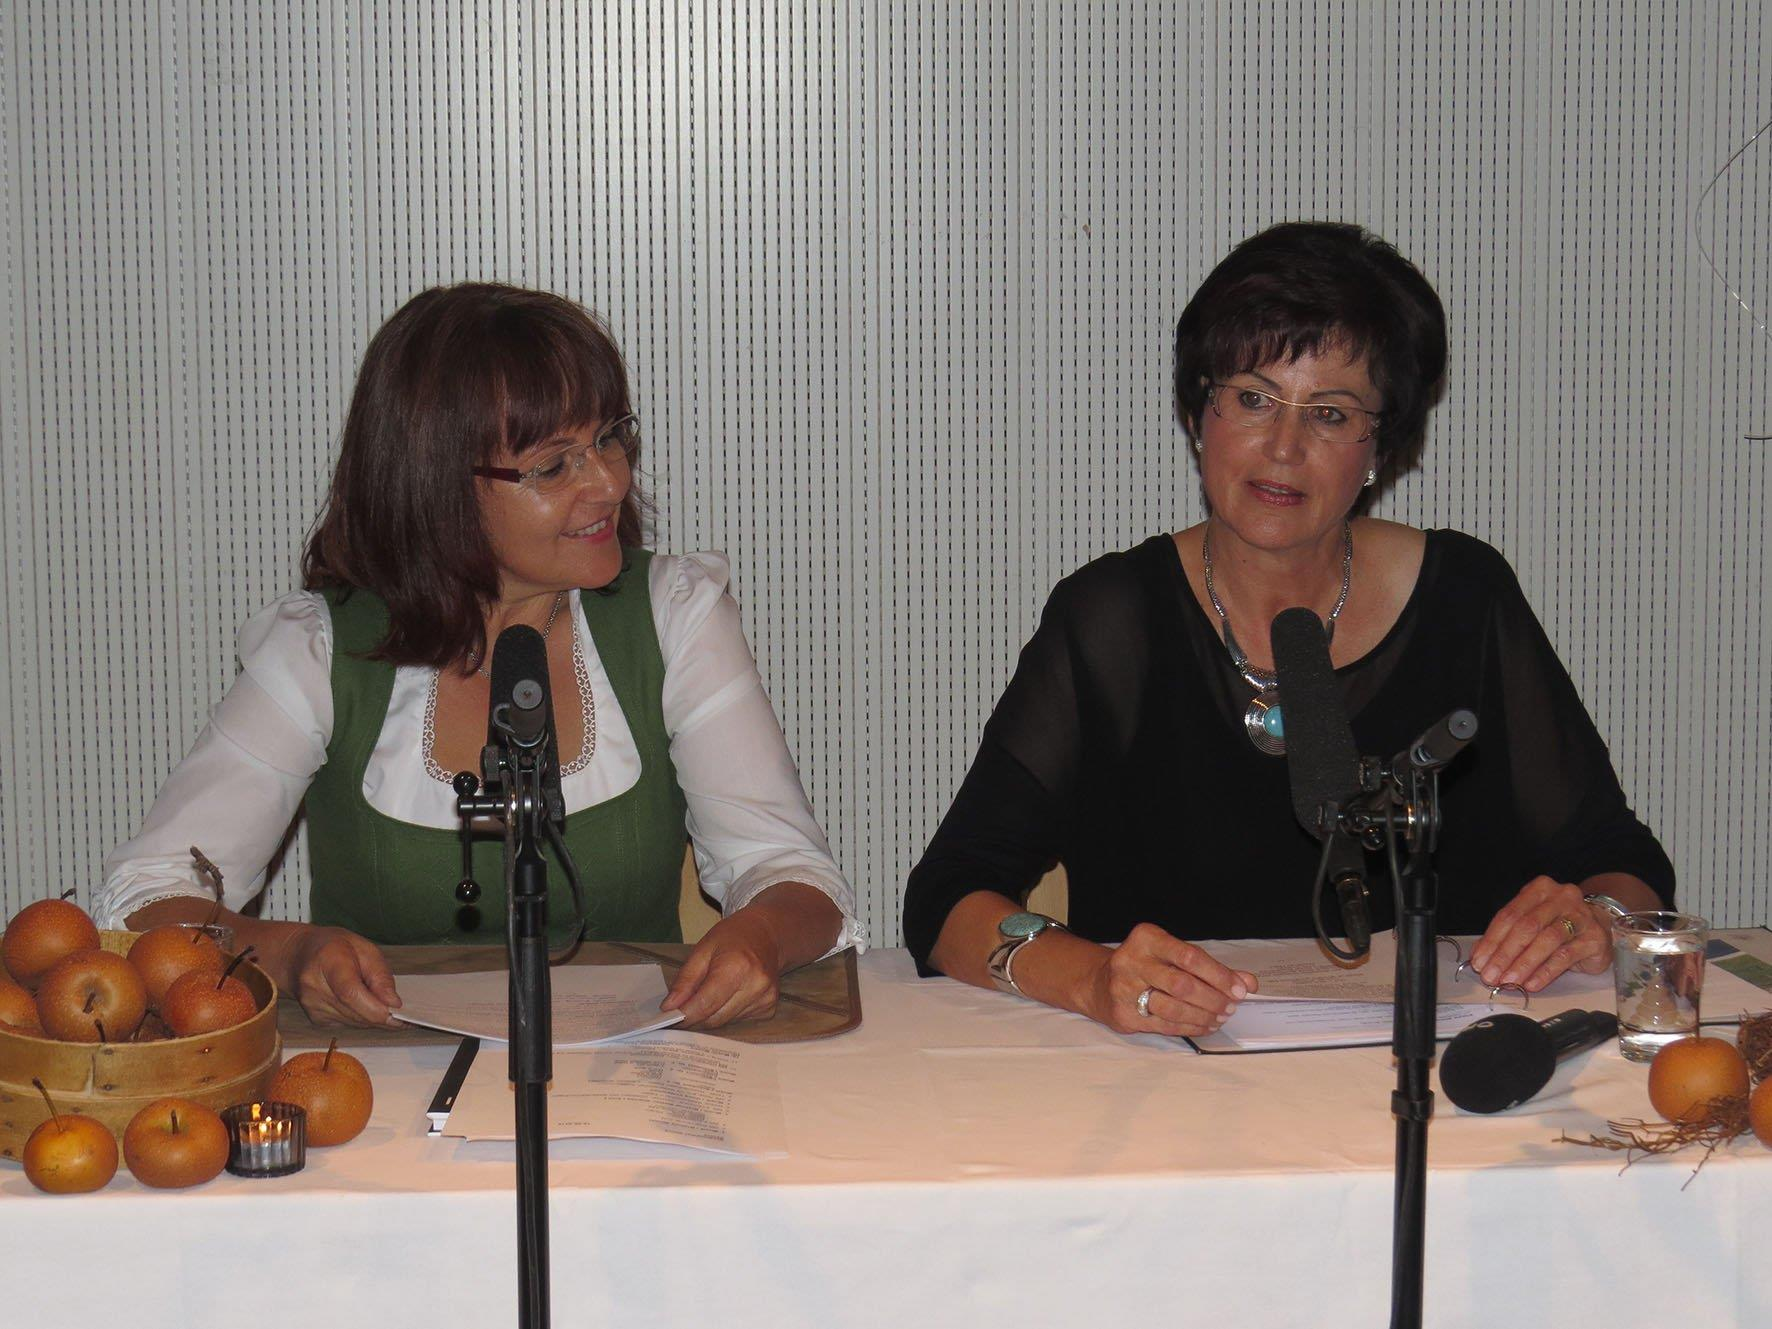 Astrid Marte rechts im Bild Mundart-Mai Teilnehmerin